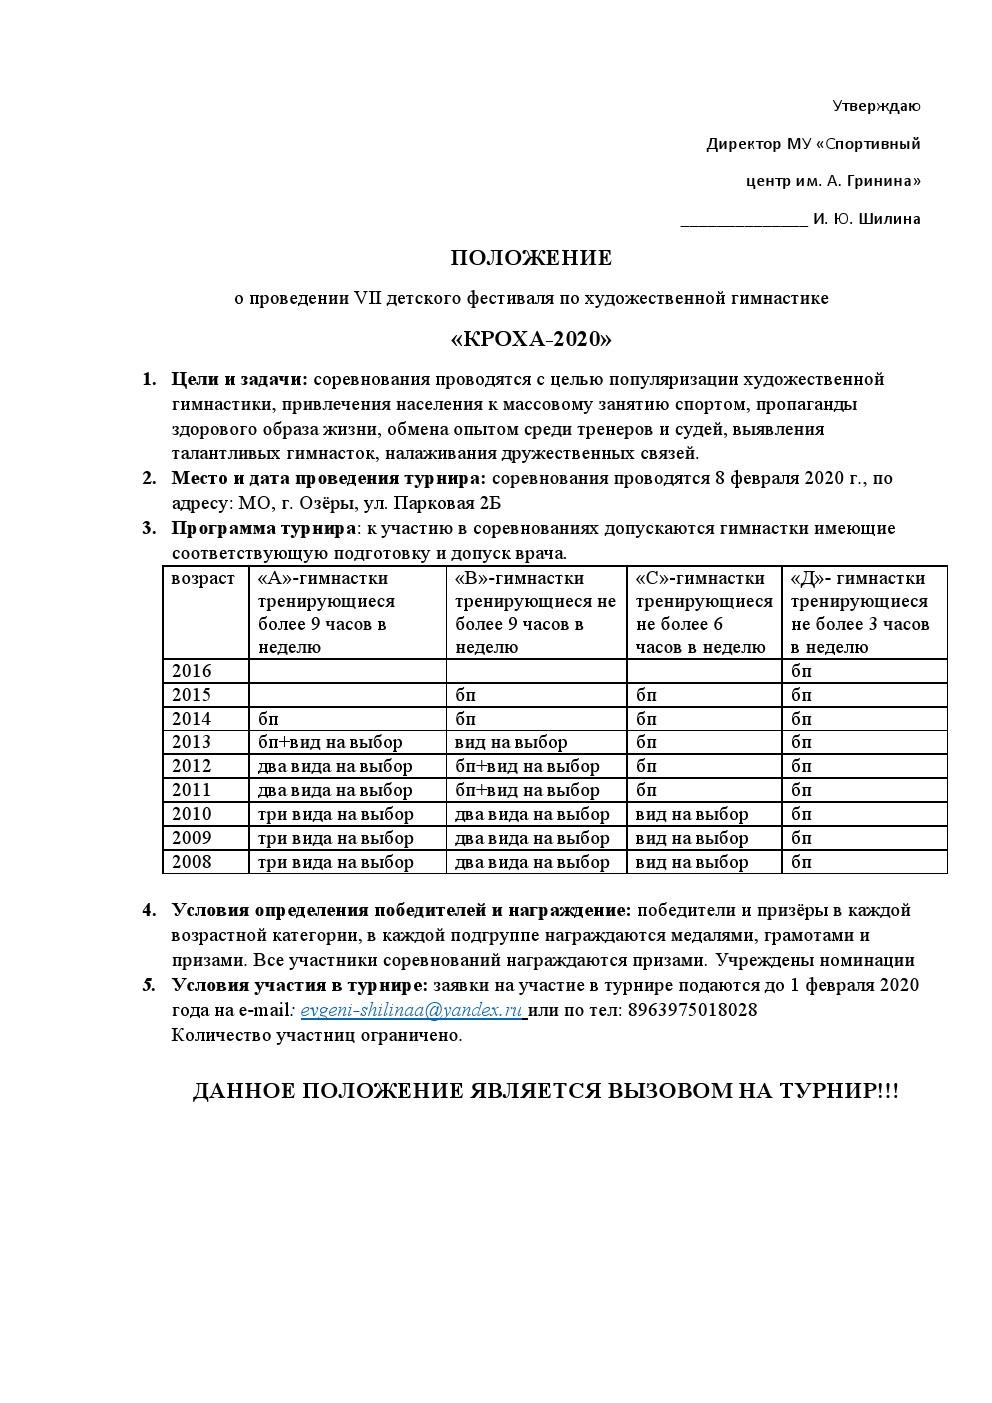 Кроха-2020